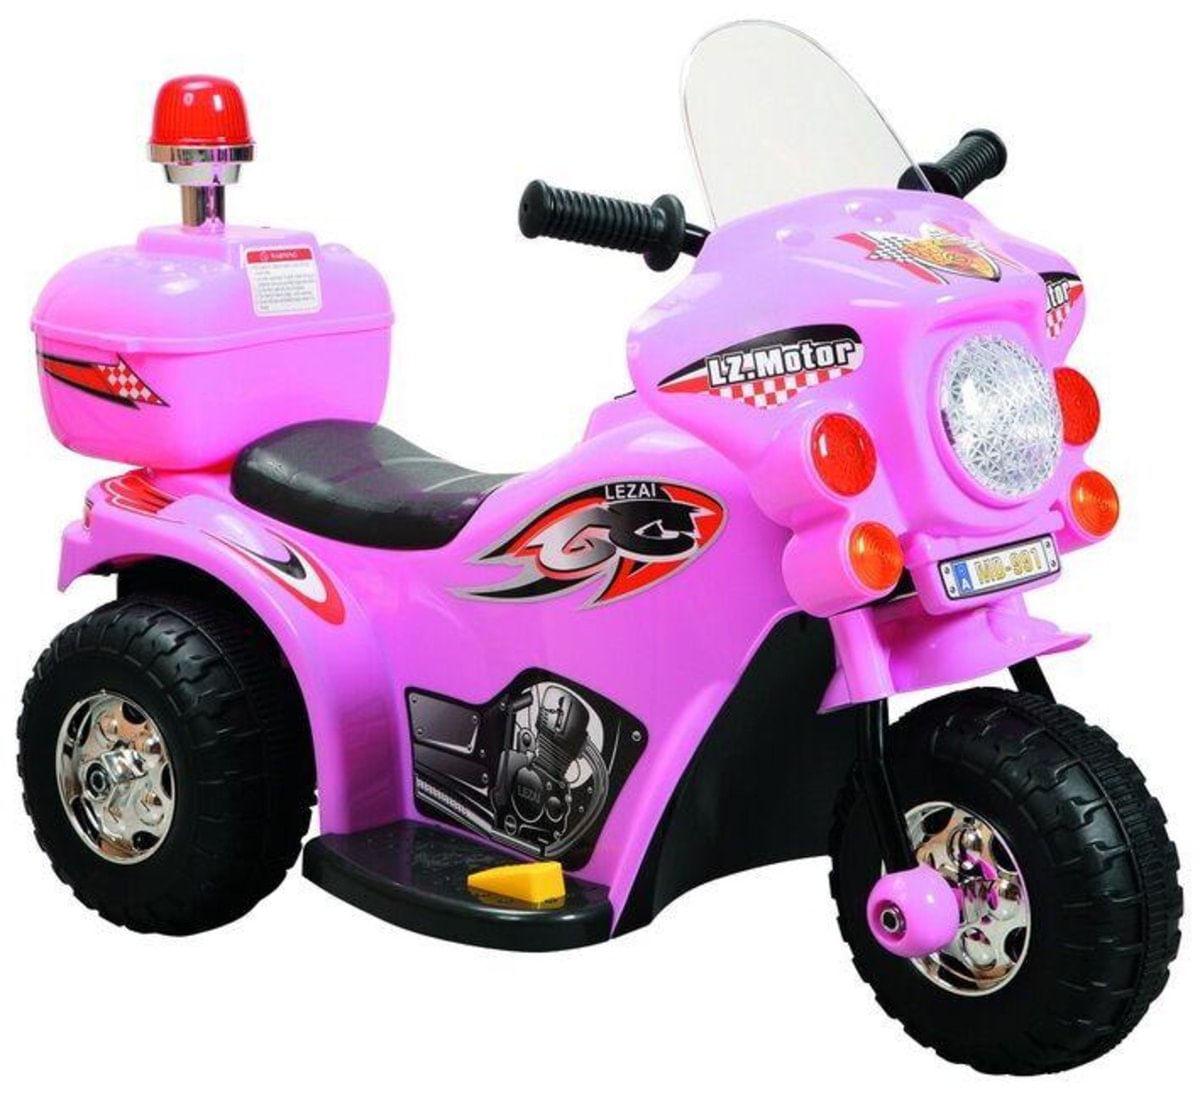 Menor preço em Mini moto Elétrica Infantil 7,5v-Rosa